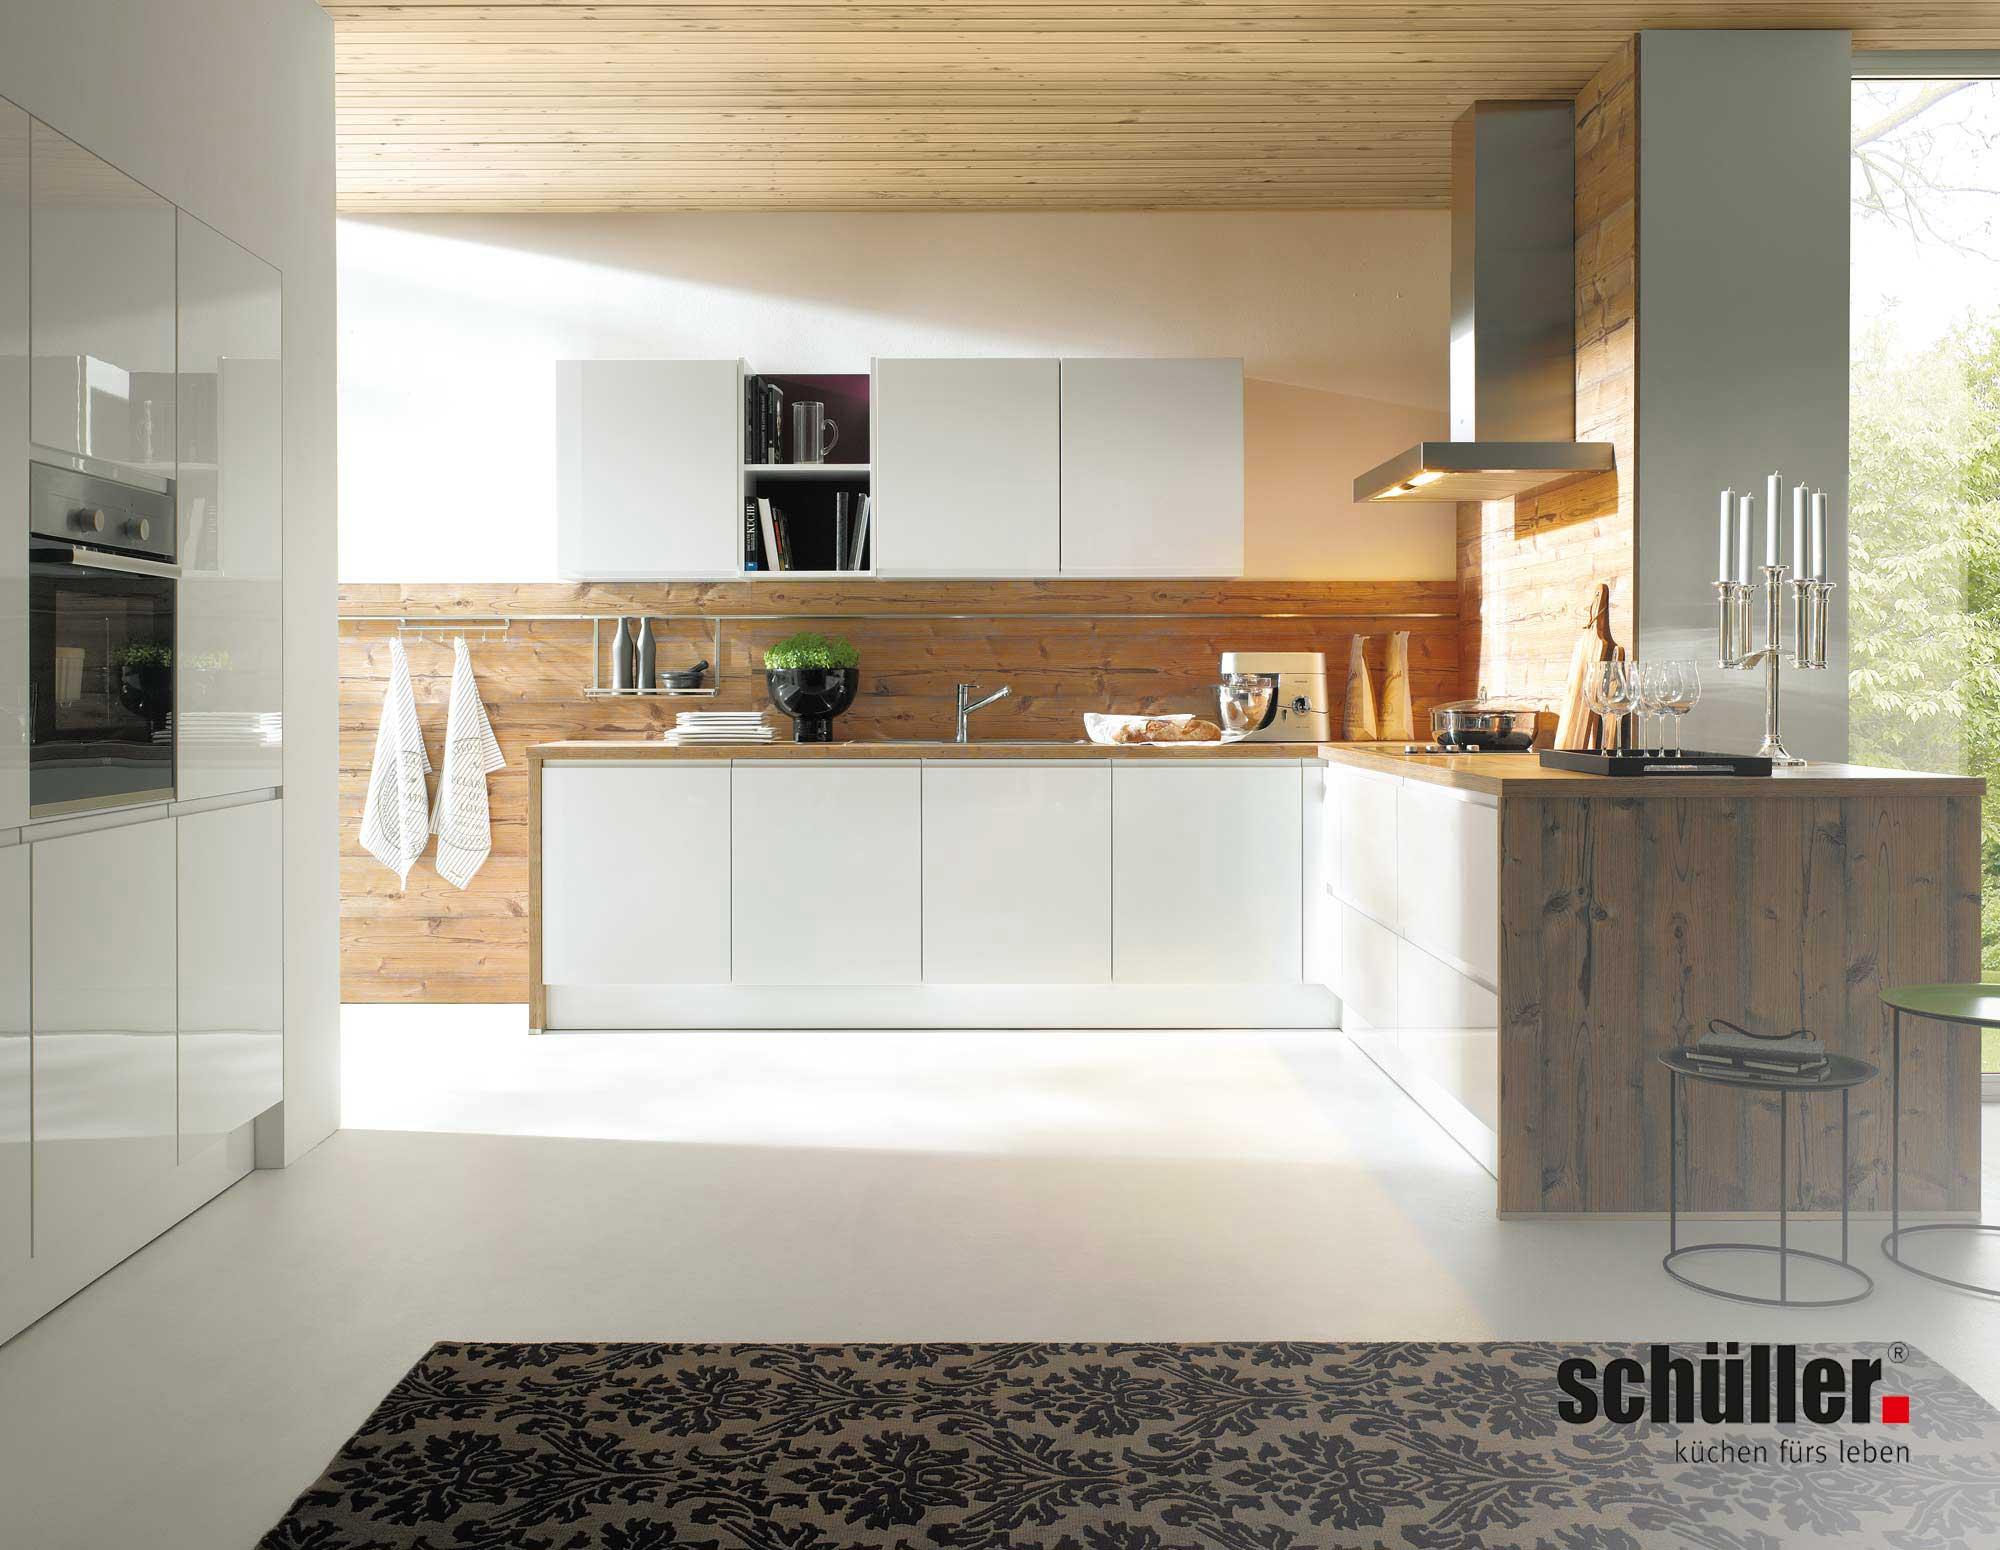 Full Size of Ikea Küche Grau Hochglanz Gebraucht Küche Grau Weiß Hochglanz Nolte Küche Grau Hochglanz Küche Weiß Hochglanz Arbeitsplatte Grau Küche Küche Grau Hochglanz